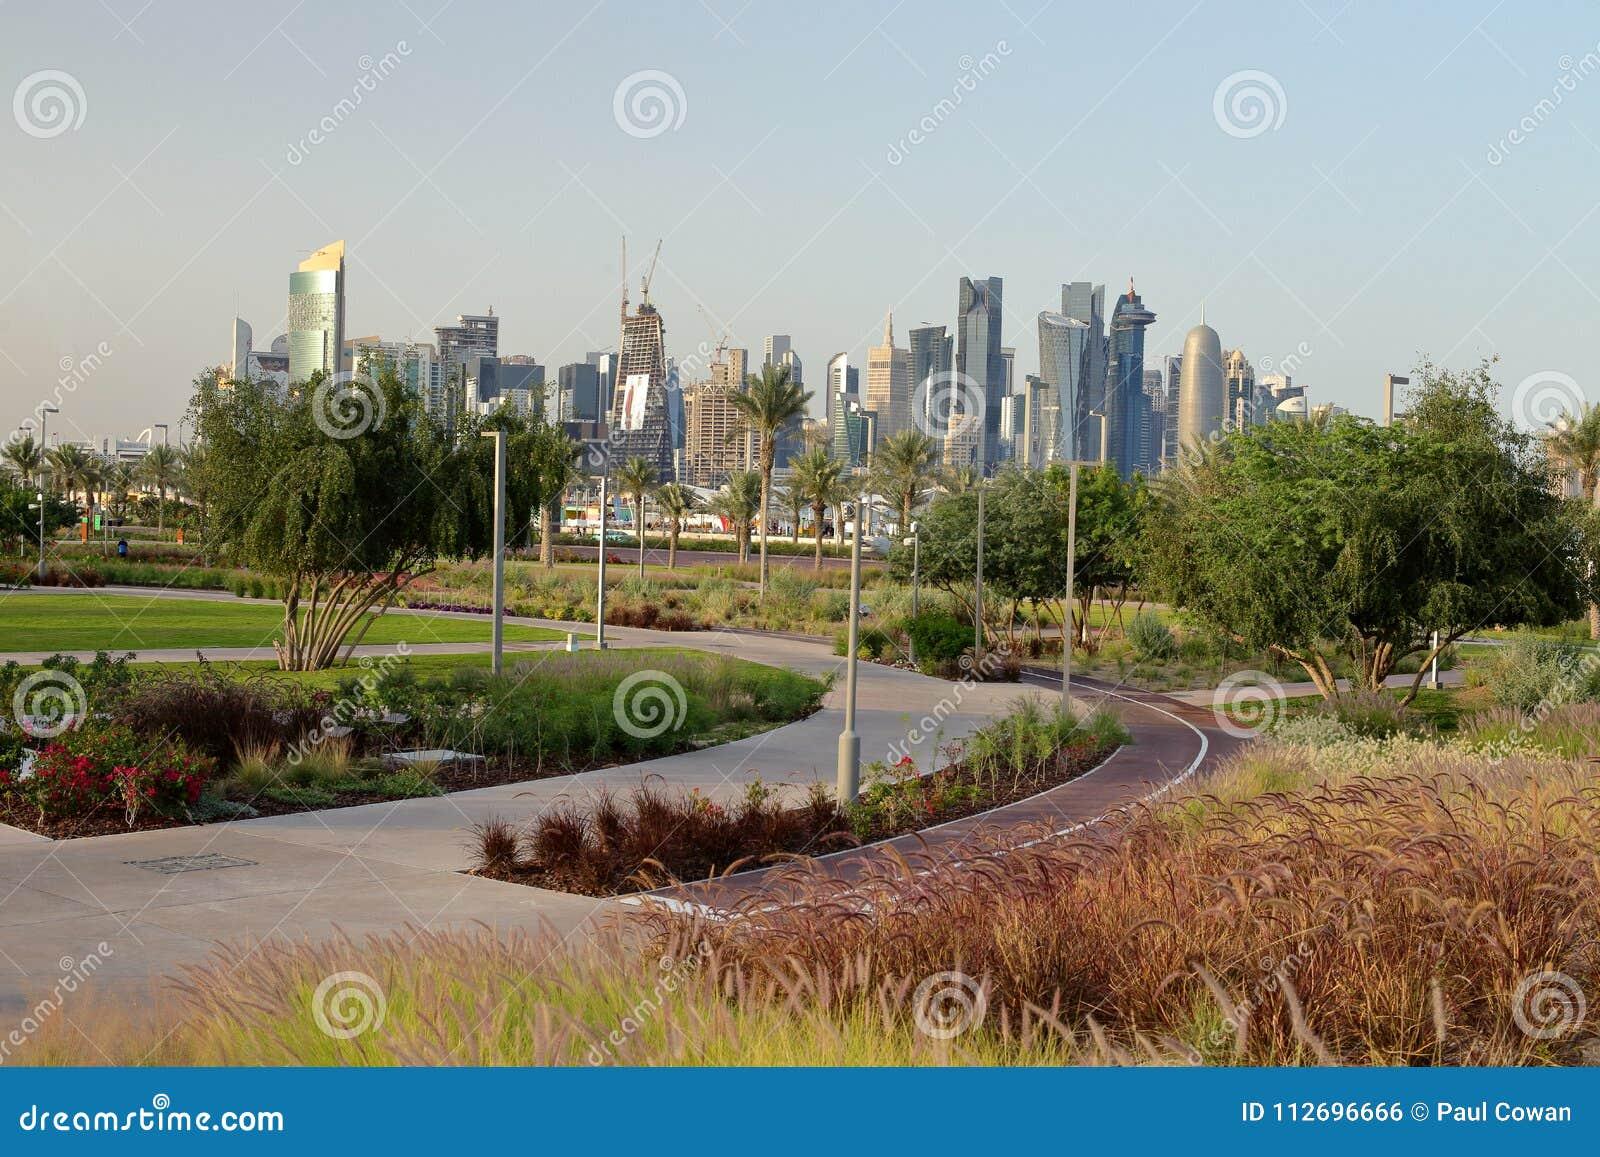 Bidda公园自行车赛车道和塔在卡塔尔